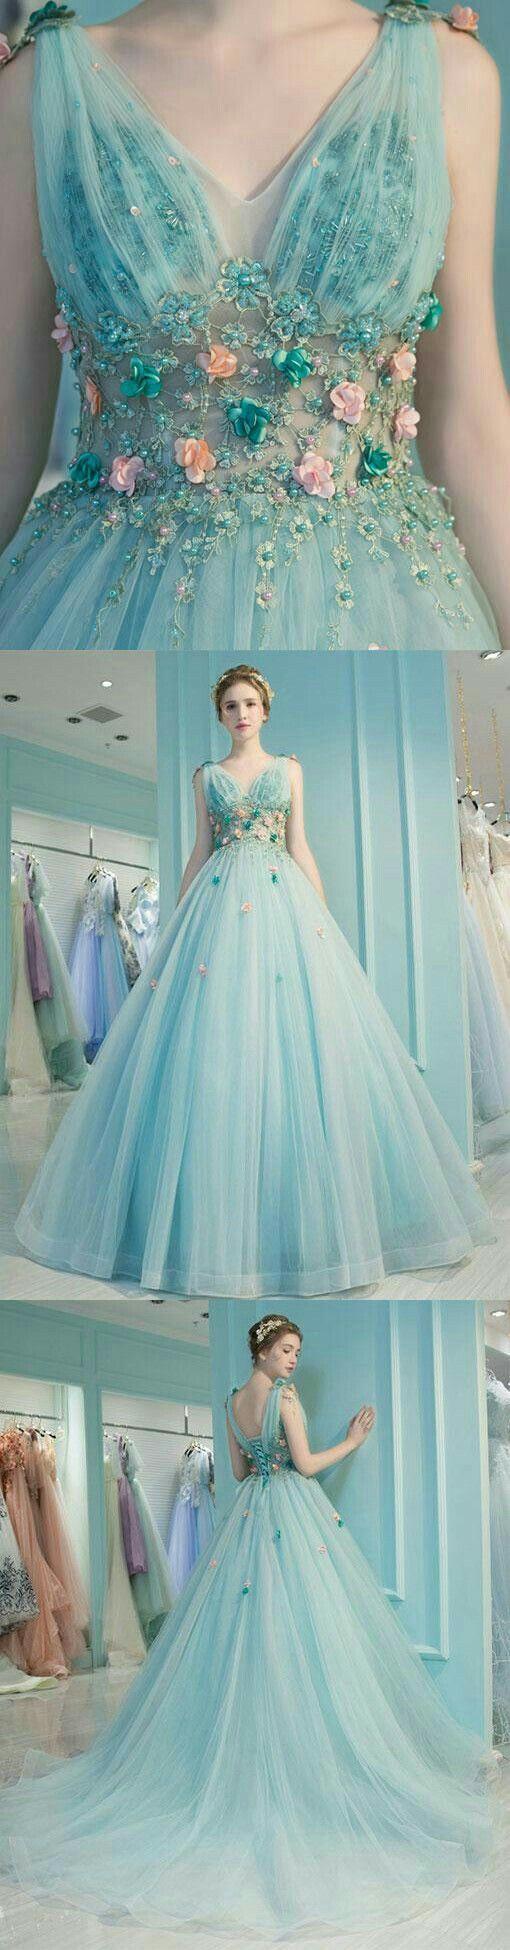 charming nattier blue wedding dressloin appliqué prom dressa